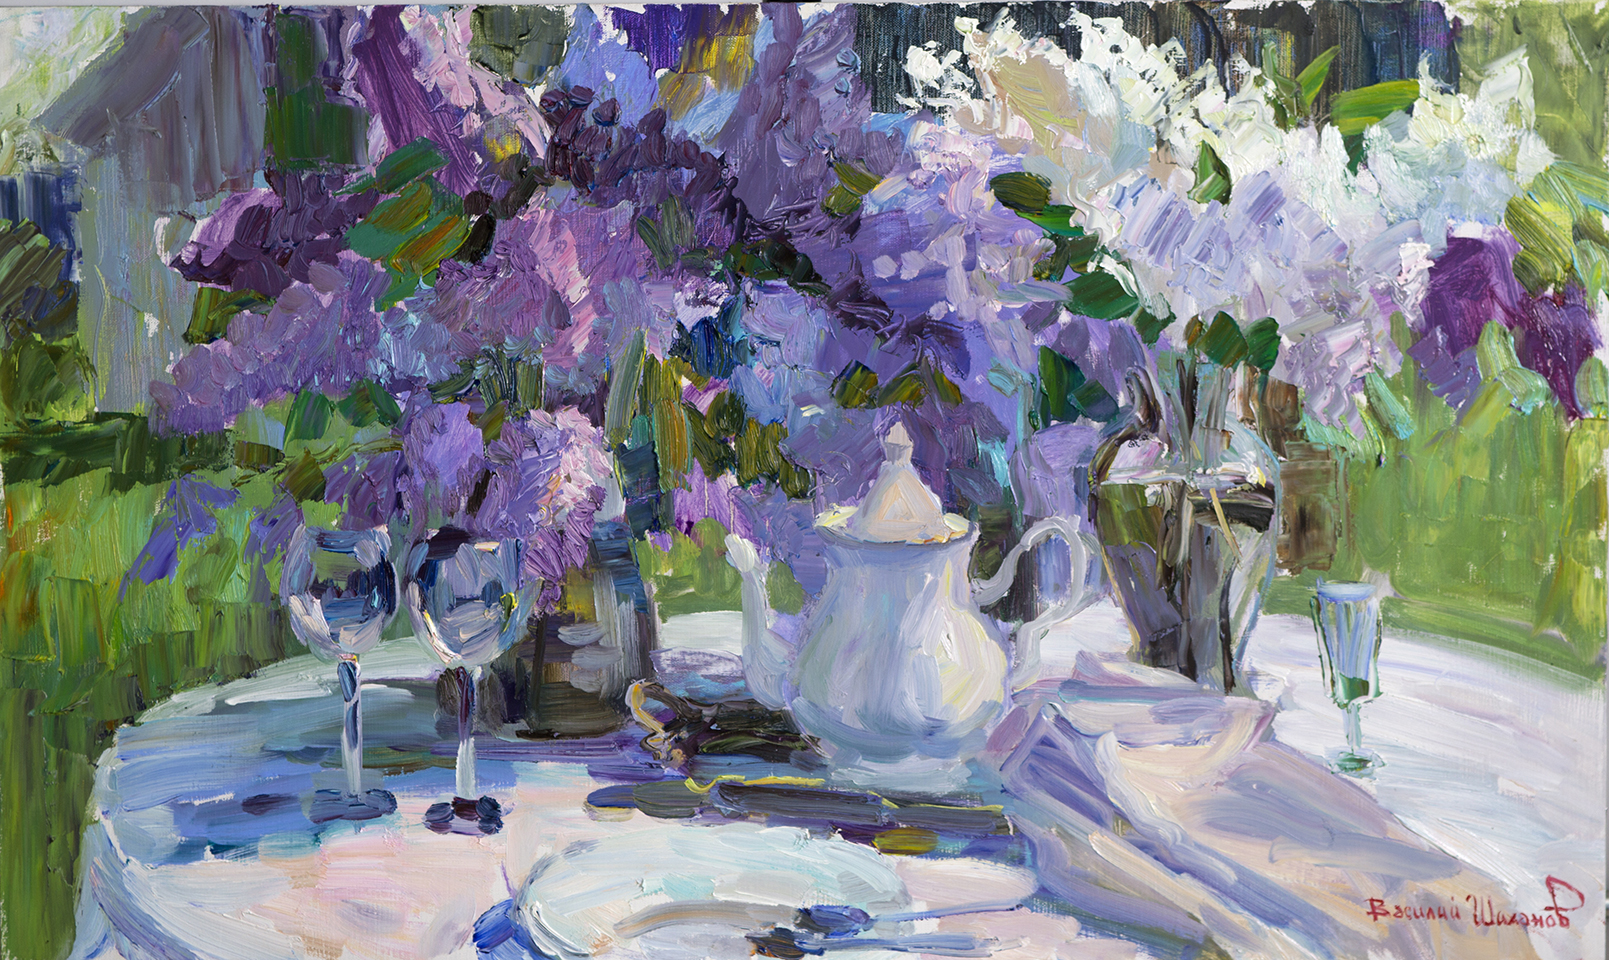 В.А.Шиханов. Дачный натюрморт с сиренью. Х.м. 60х100.2016 г.